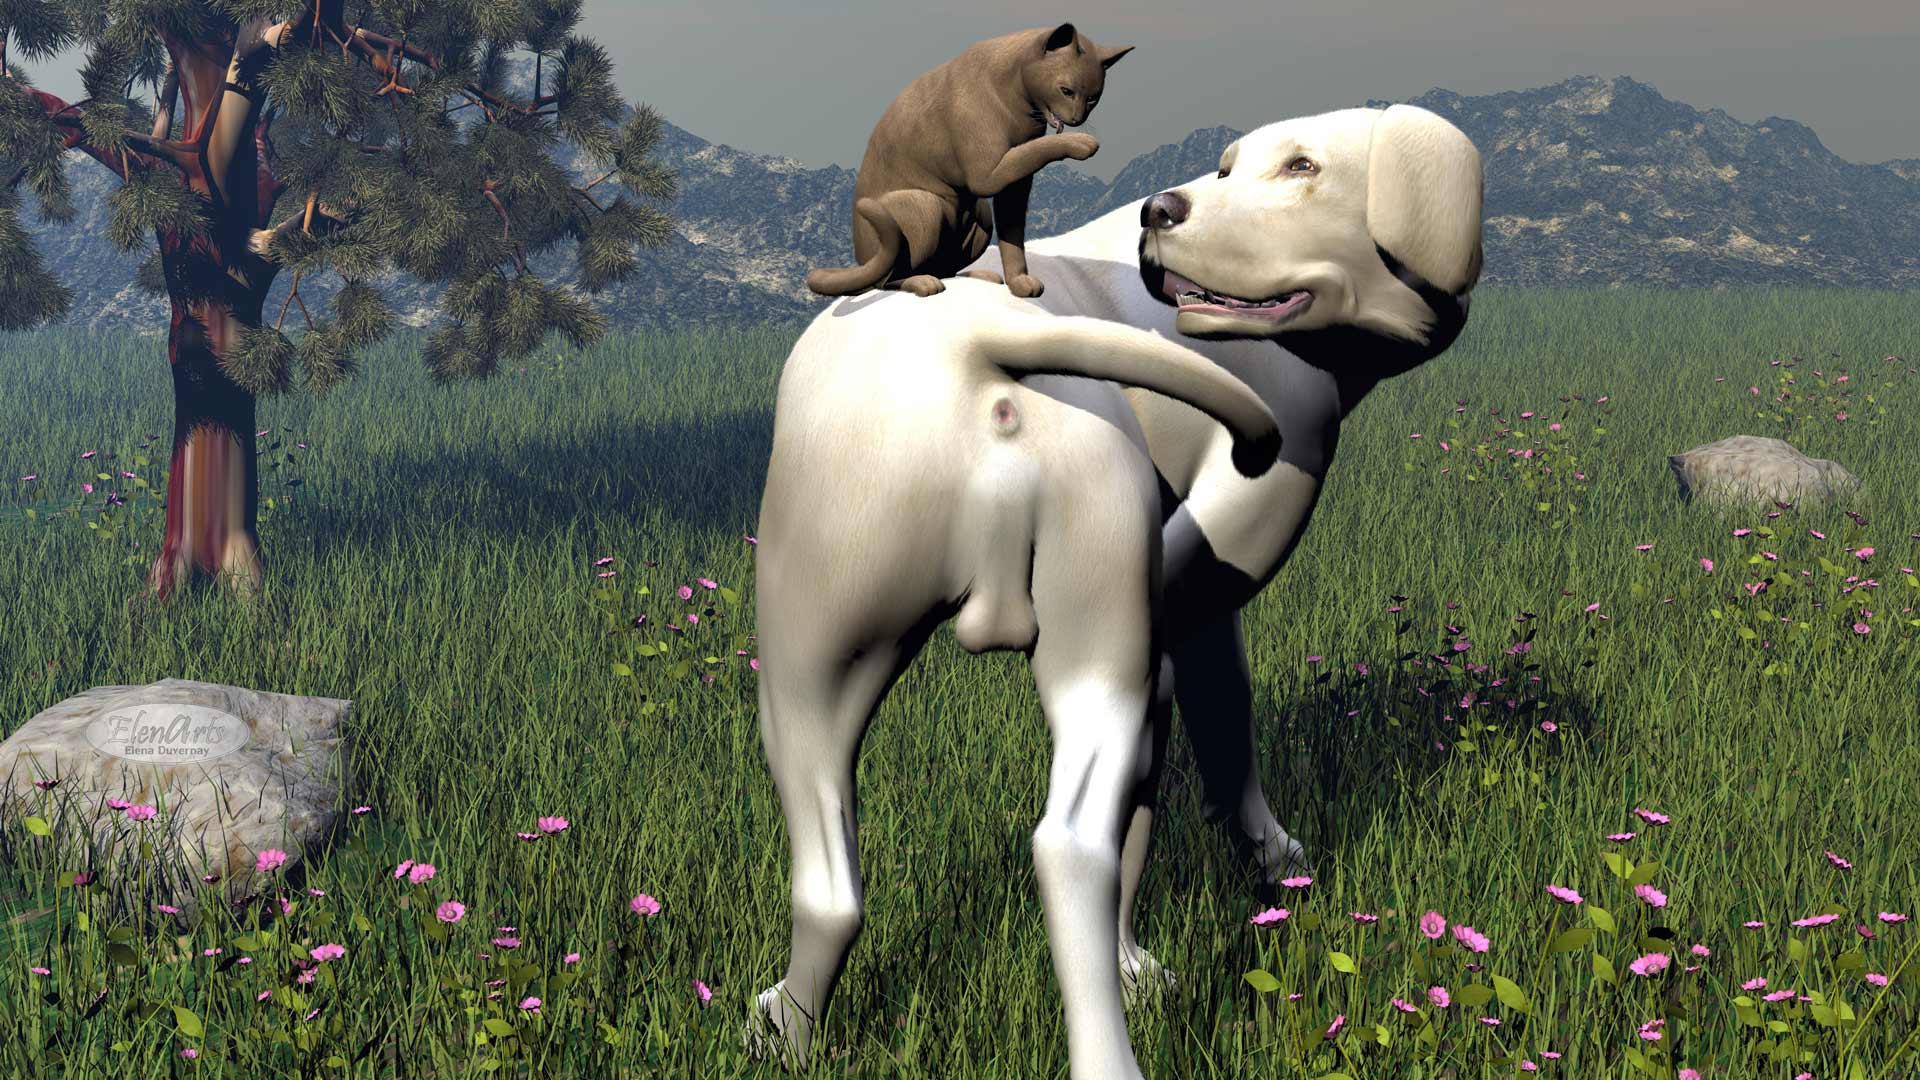 Labrador dog and abyssin cat friendship - 3D render